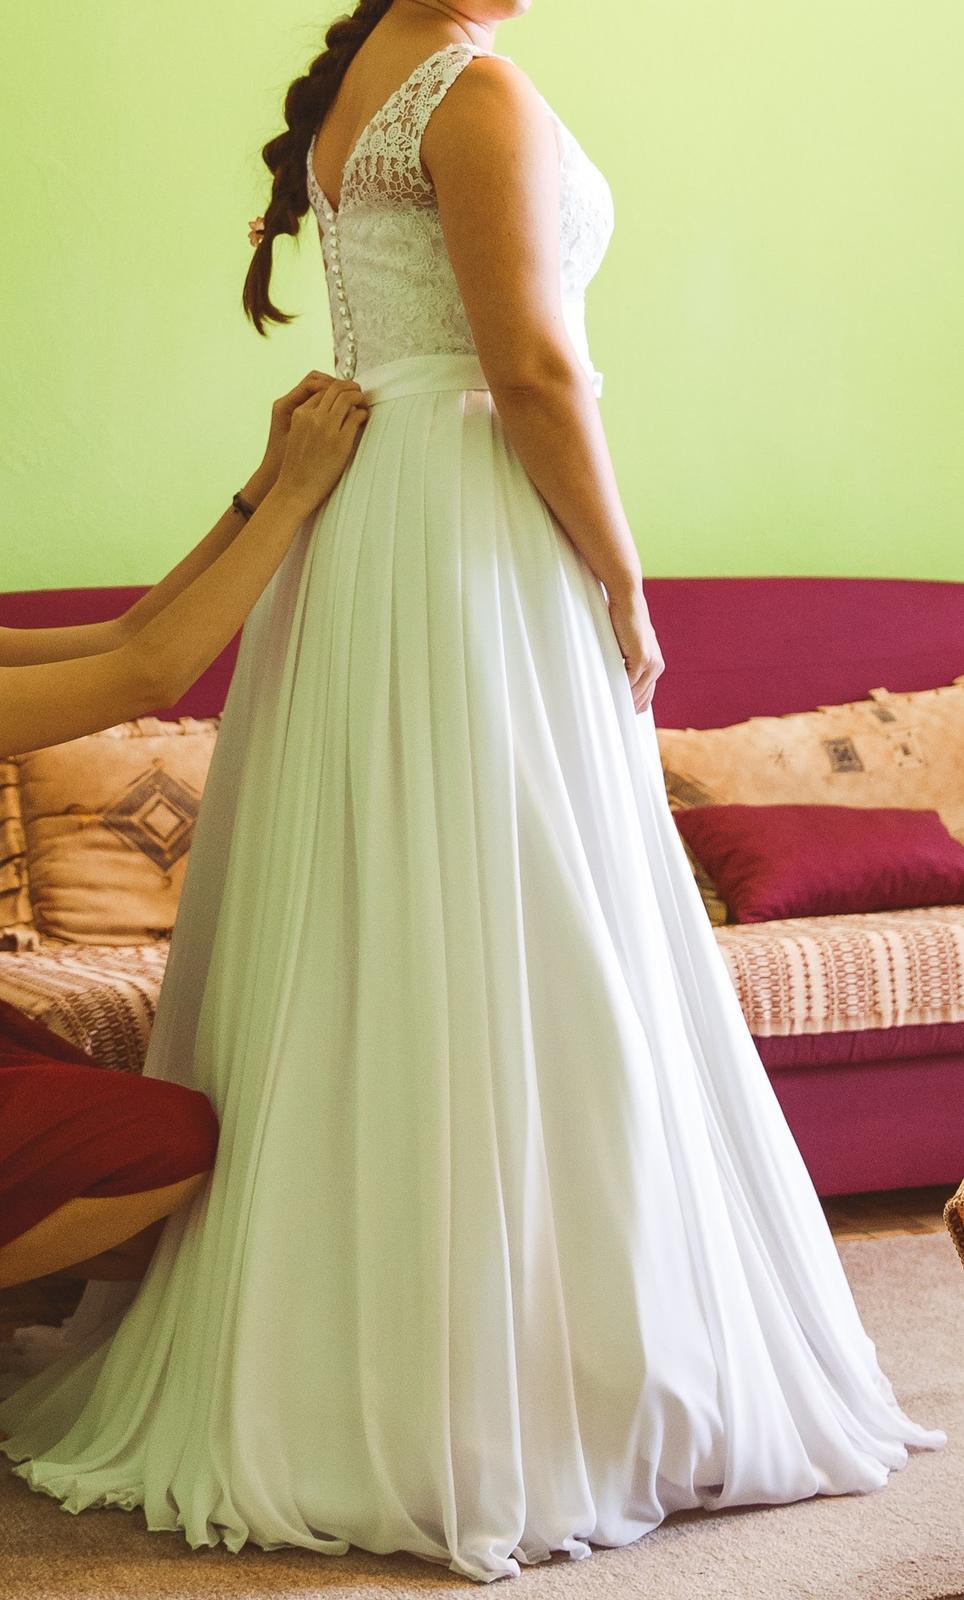 Svadobné šaty s čipkou a šifónovou sukňou 2a49df6a2d1